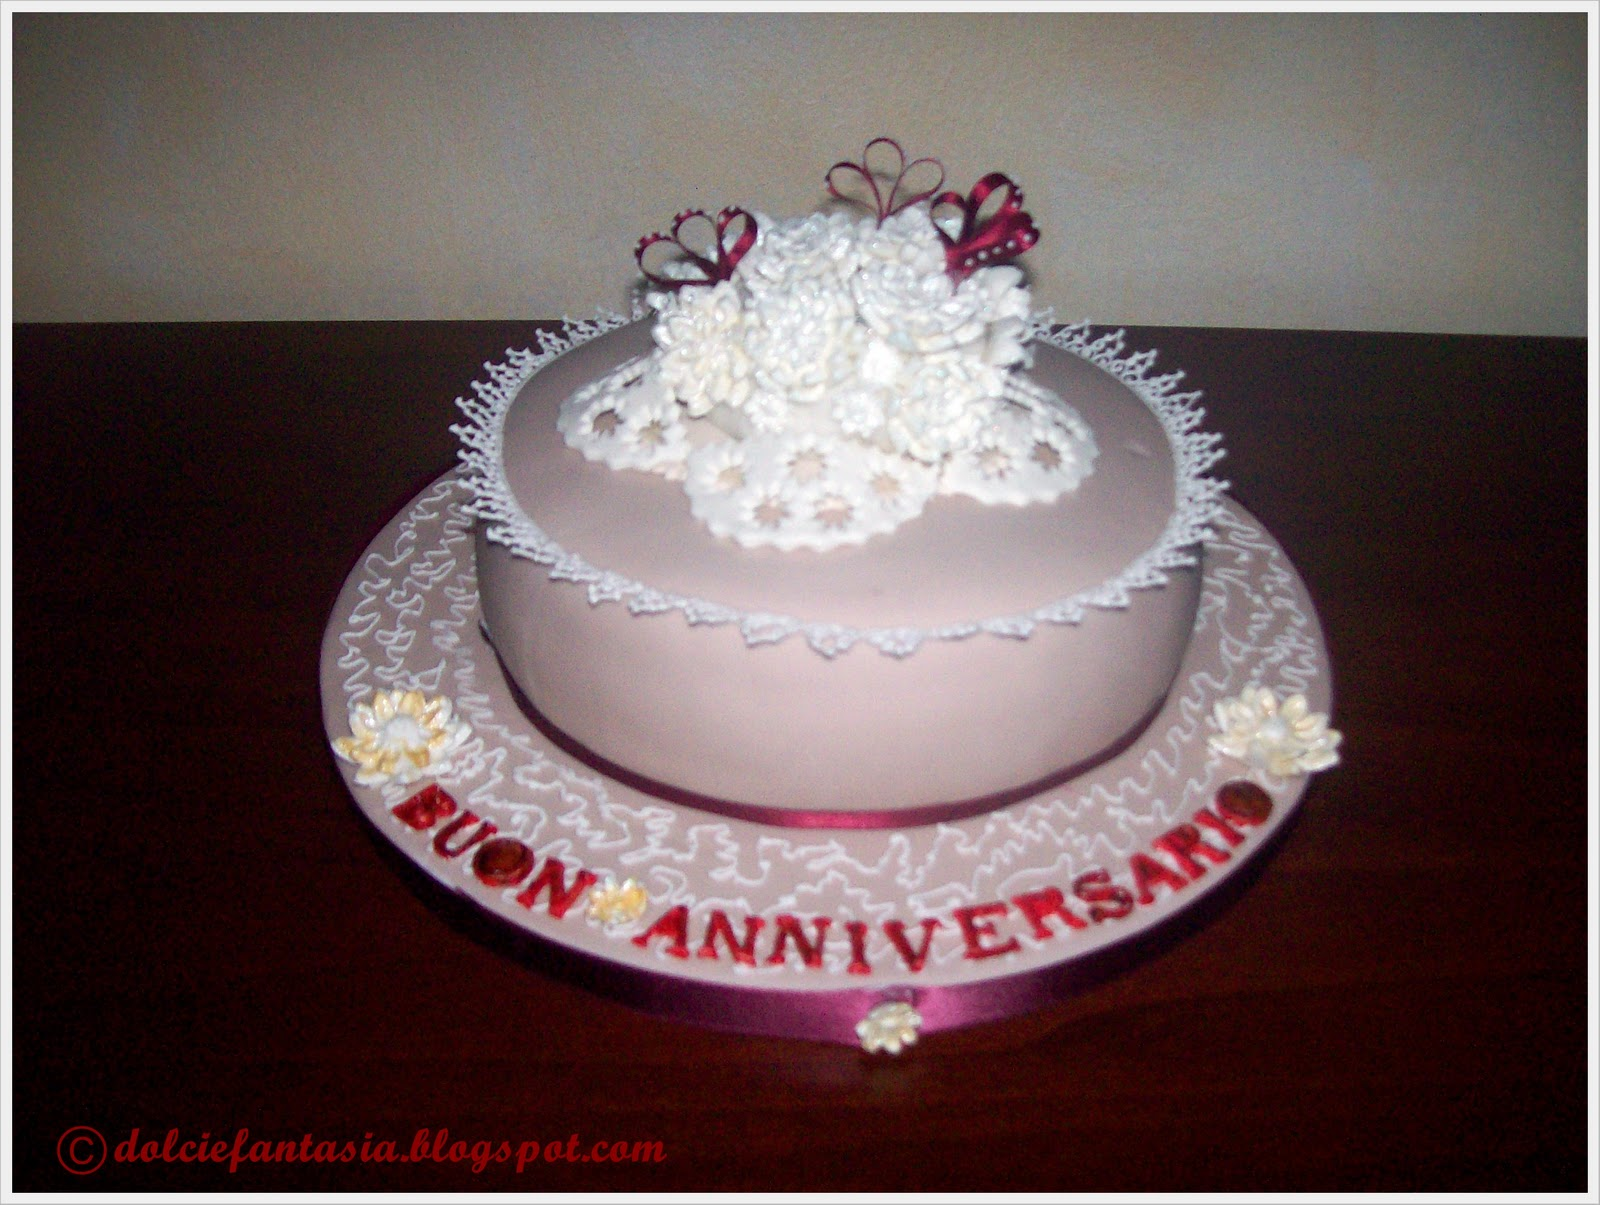 Auguri Primo Anniversario Matrimonio : Dolci e fantasia torta anniversario